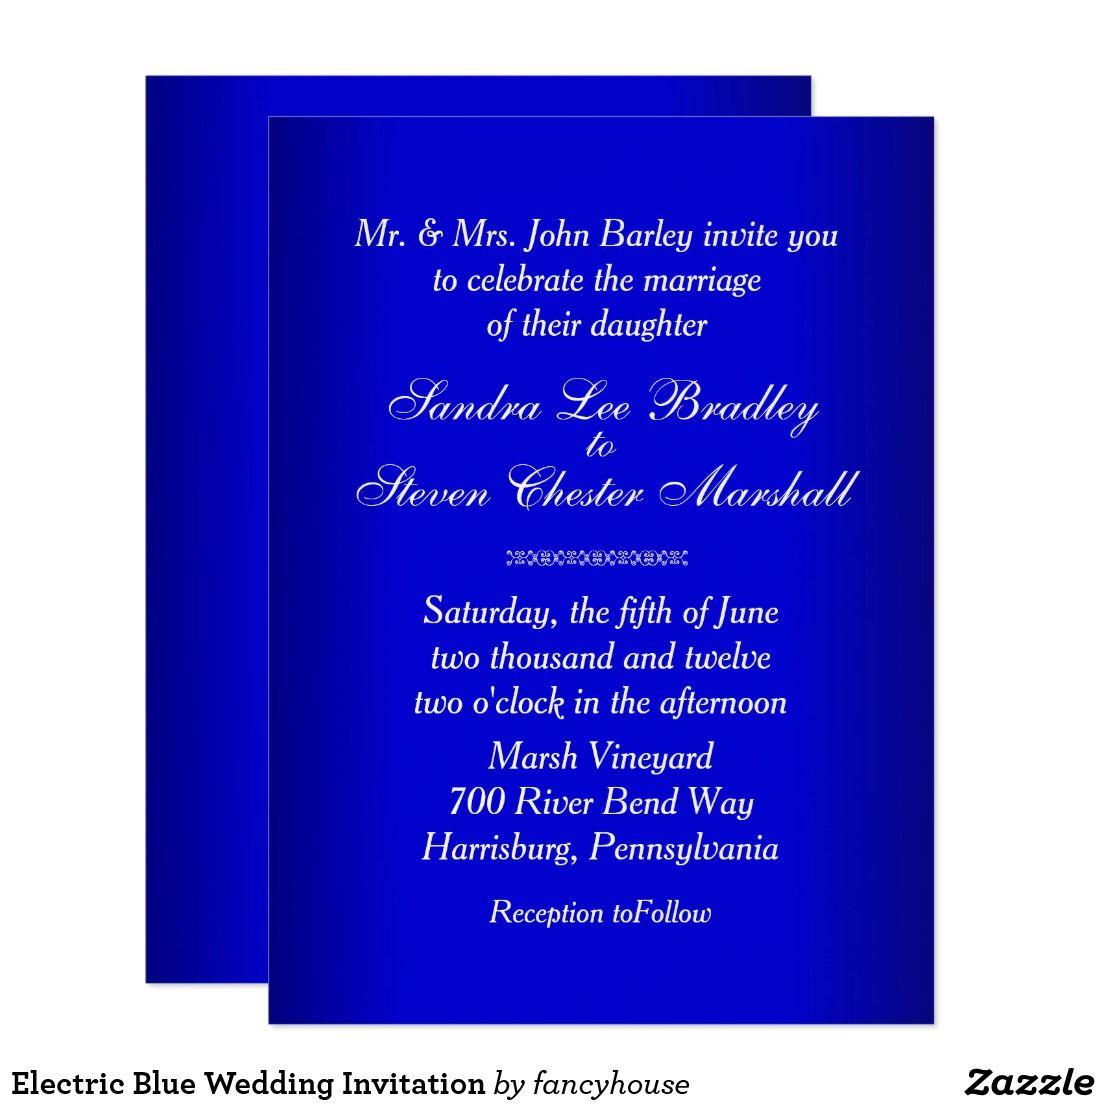 Electric Blue Wedding Invitation | Blue Wedding | Pinterest ...